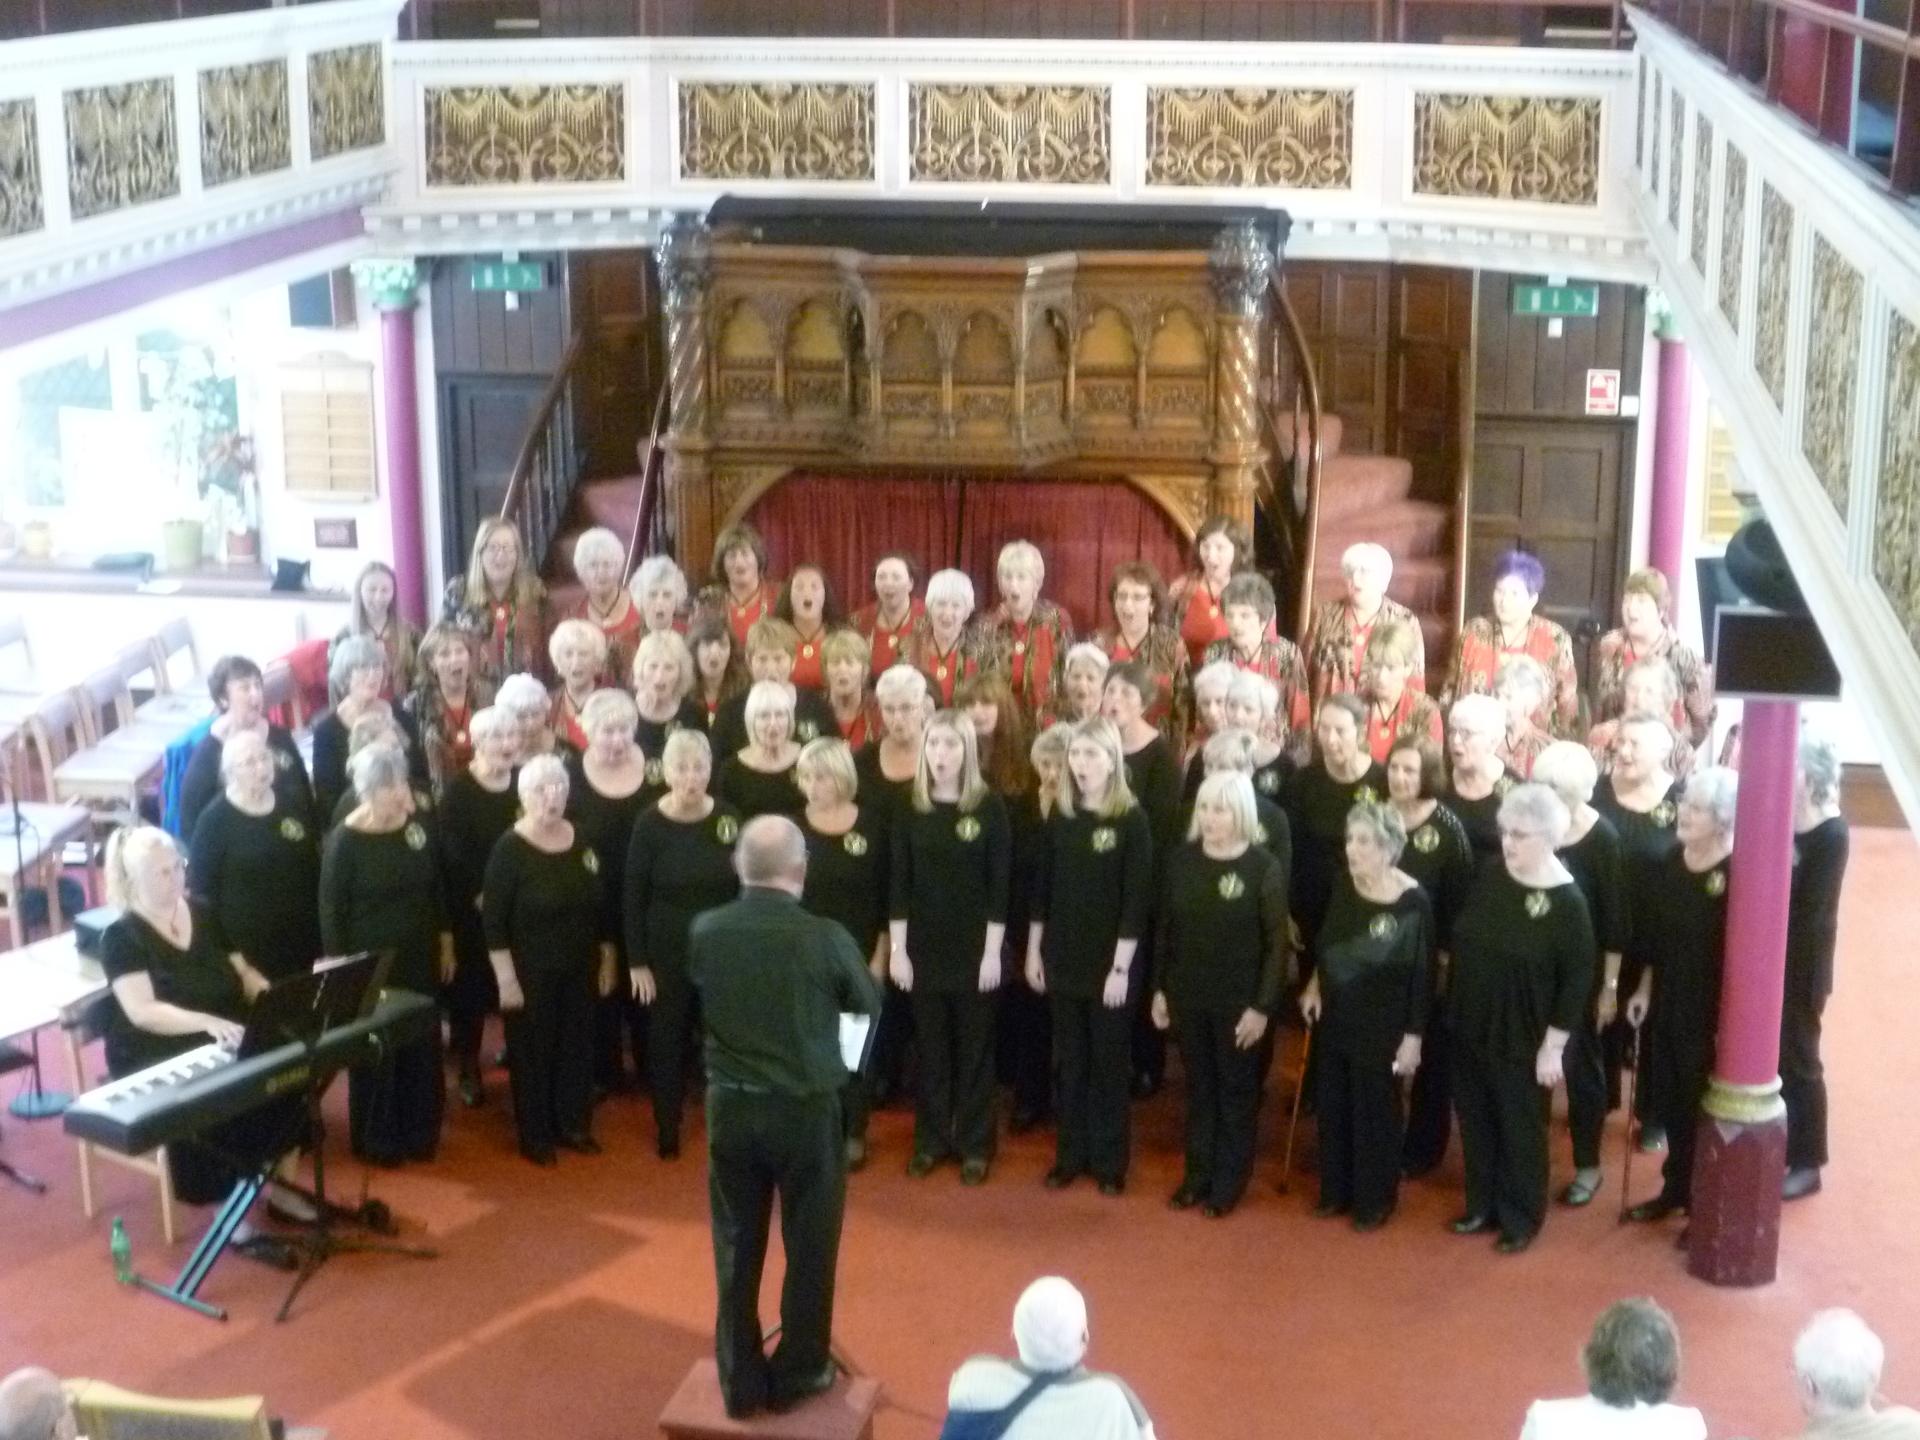 Concert with the Penzance Orpheus Ladies Choir